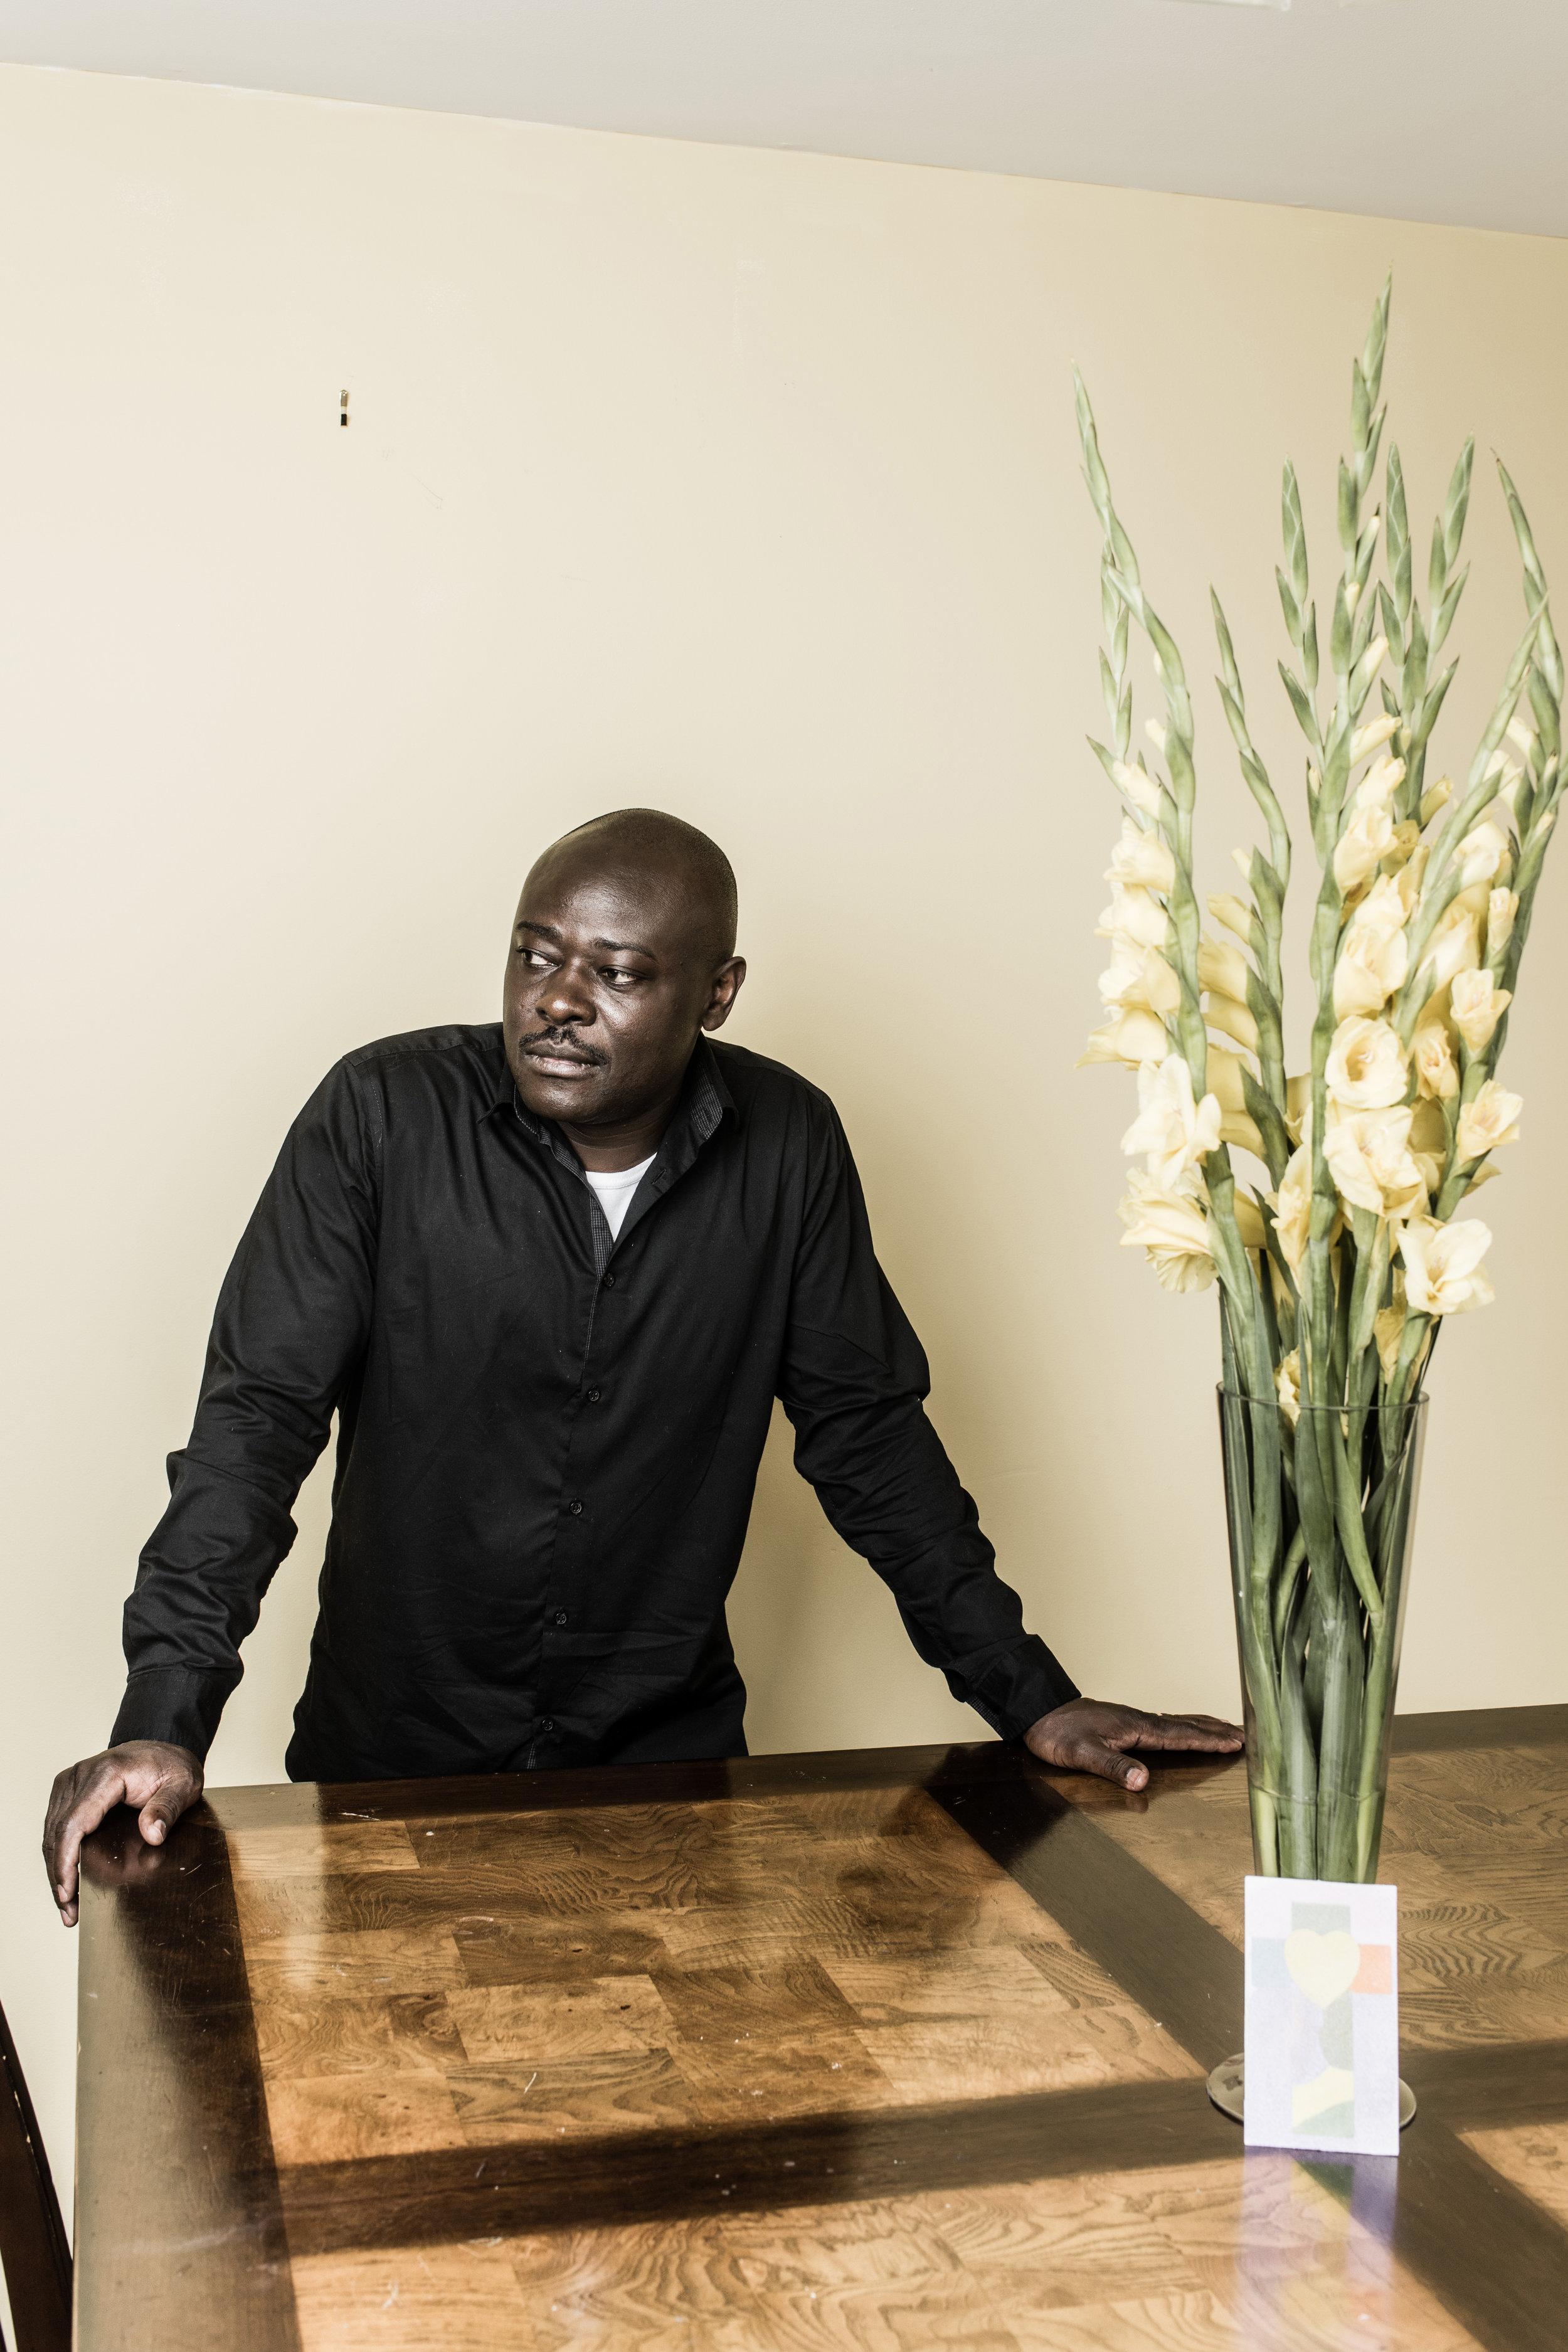 Author Helon Habila